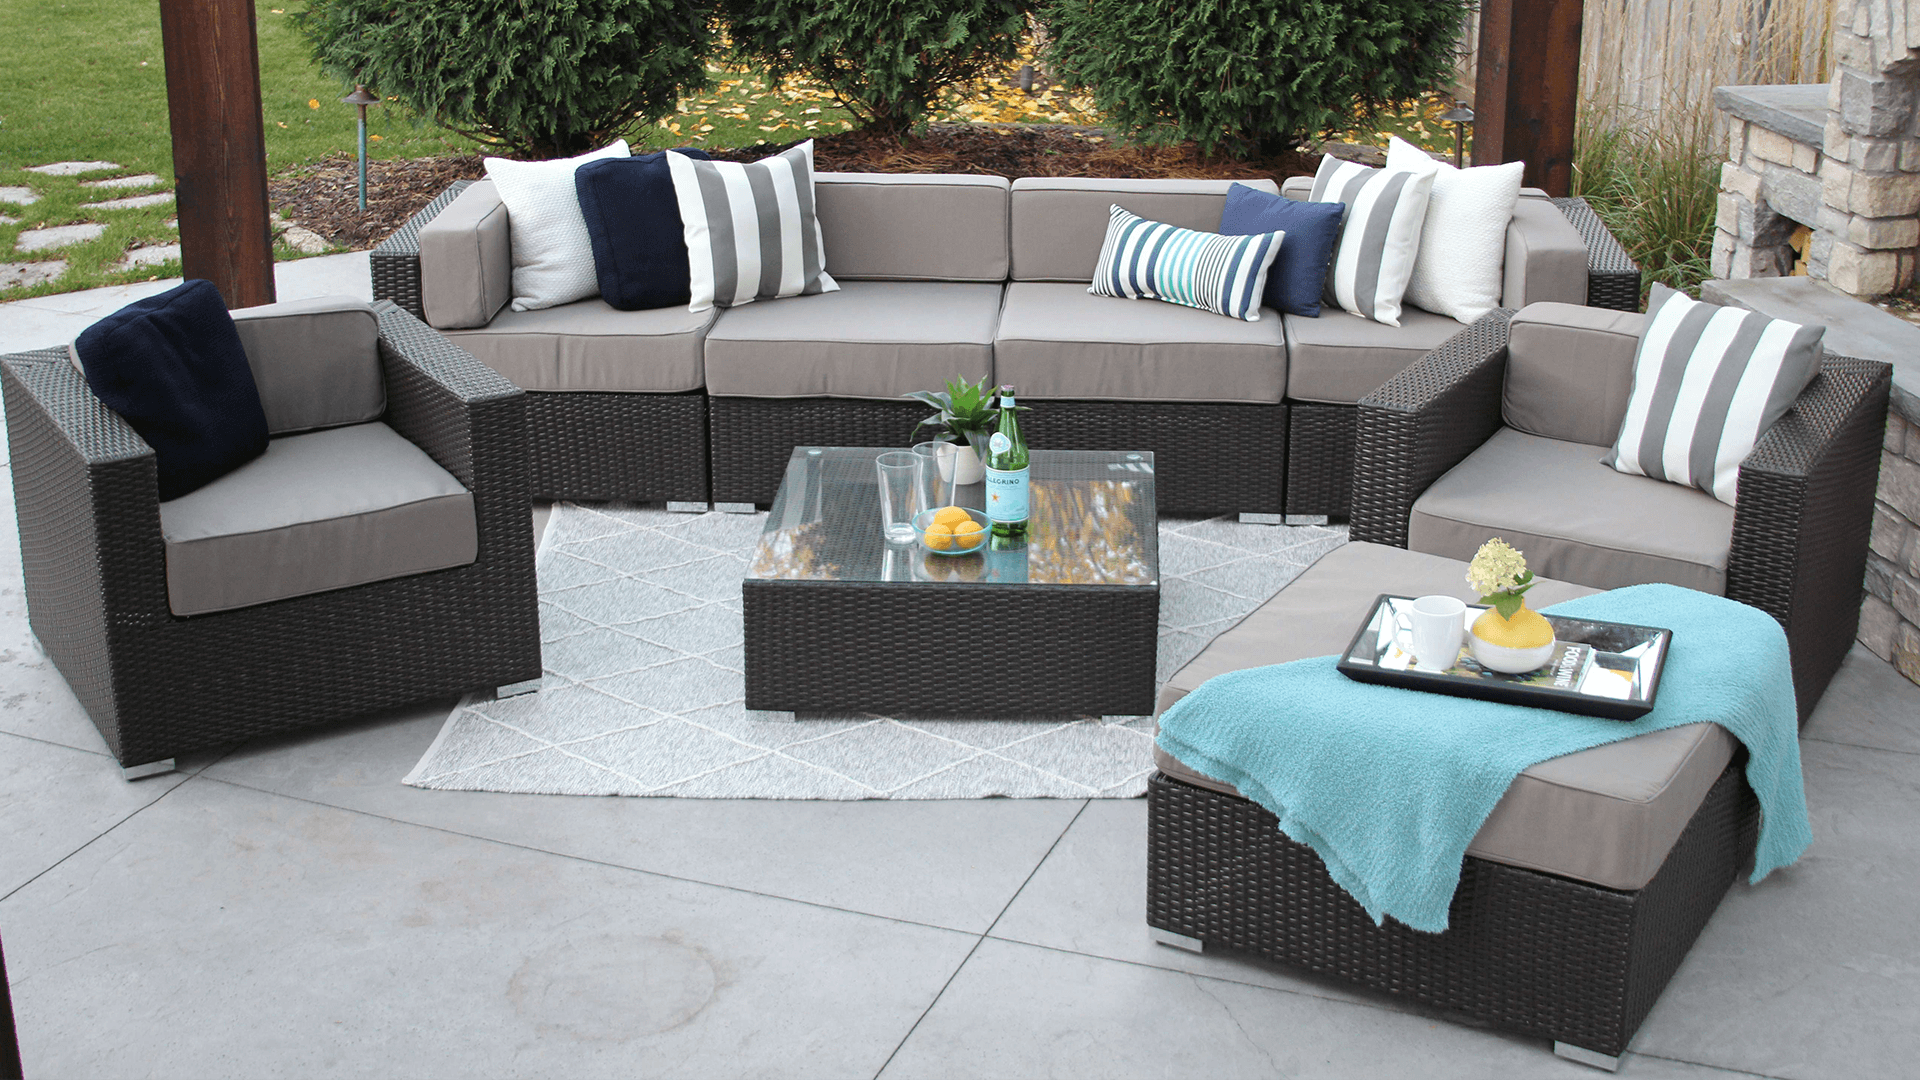 Lincoln 8 Piece Wicker Patio Sofa Sectional — MELDECCO PATIO FURNITURE